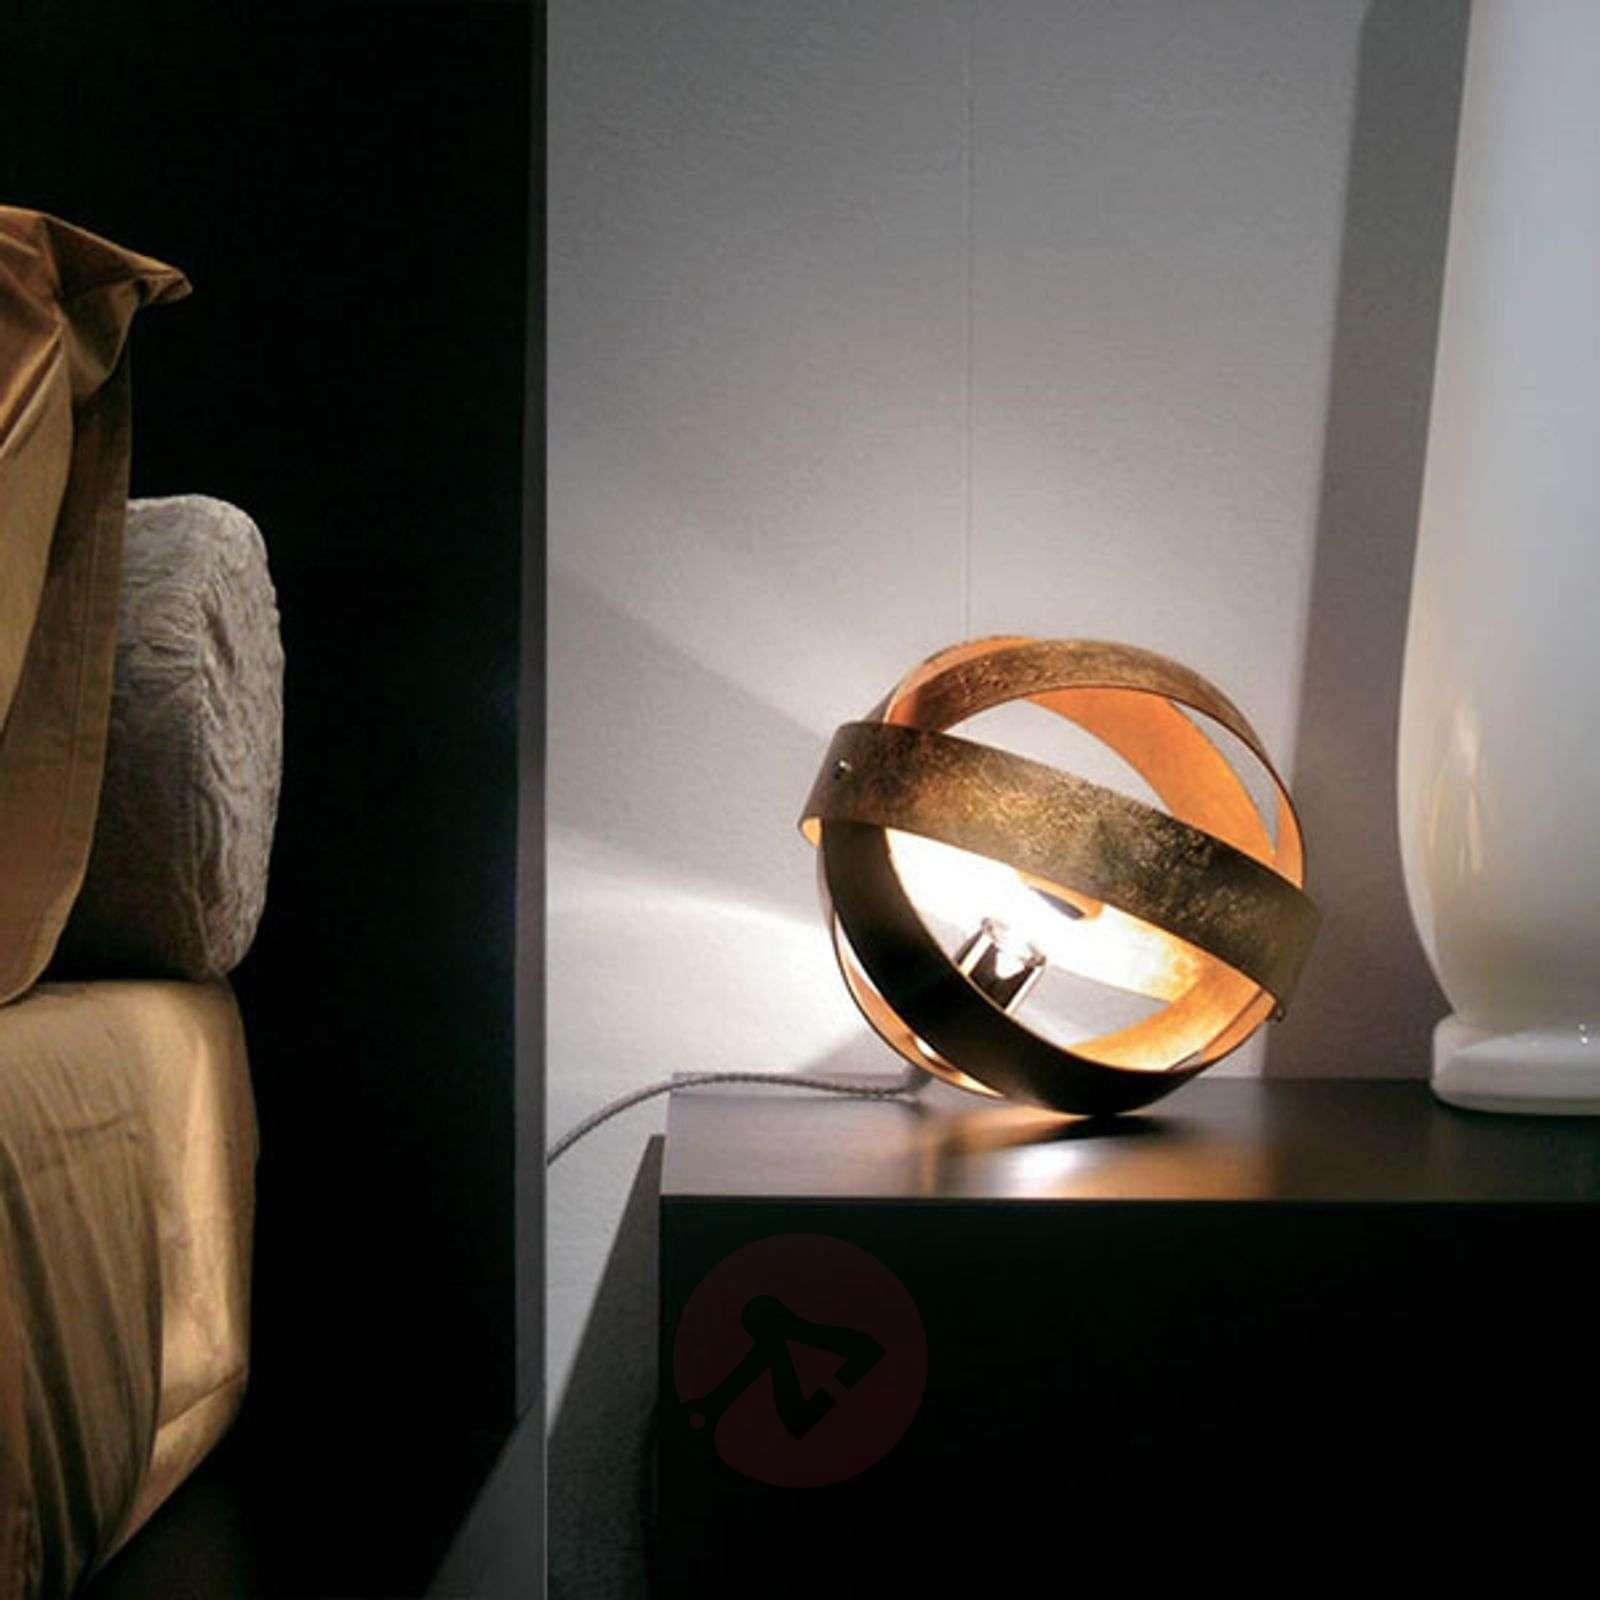 Knikerboker Ecliptika modern LED table lamp-5538100-01